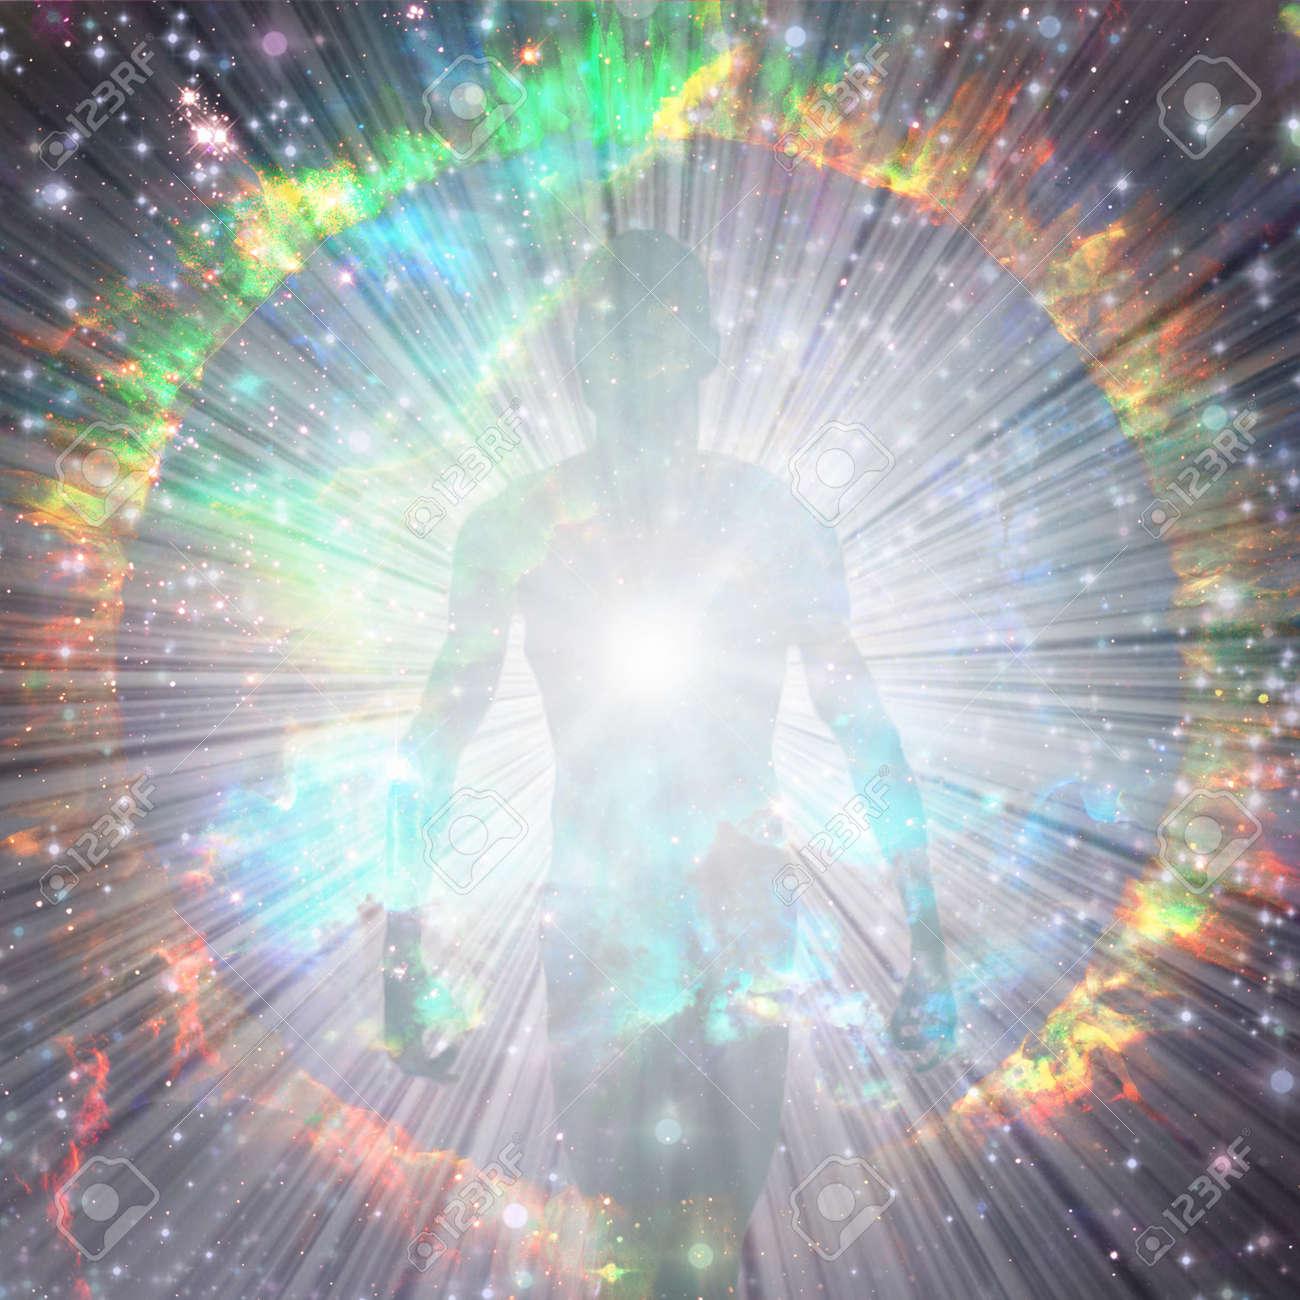 Shining aura and rays of light - 130980716